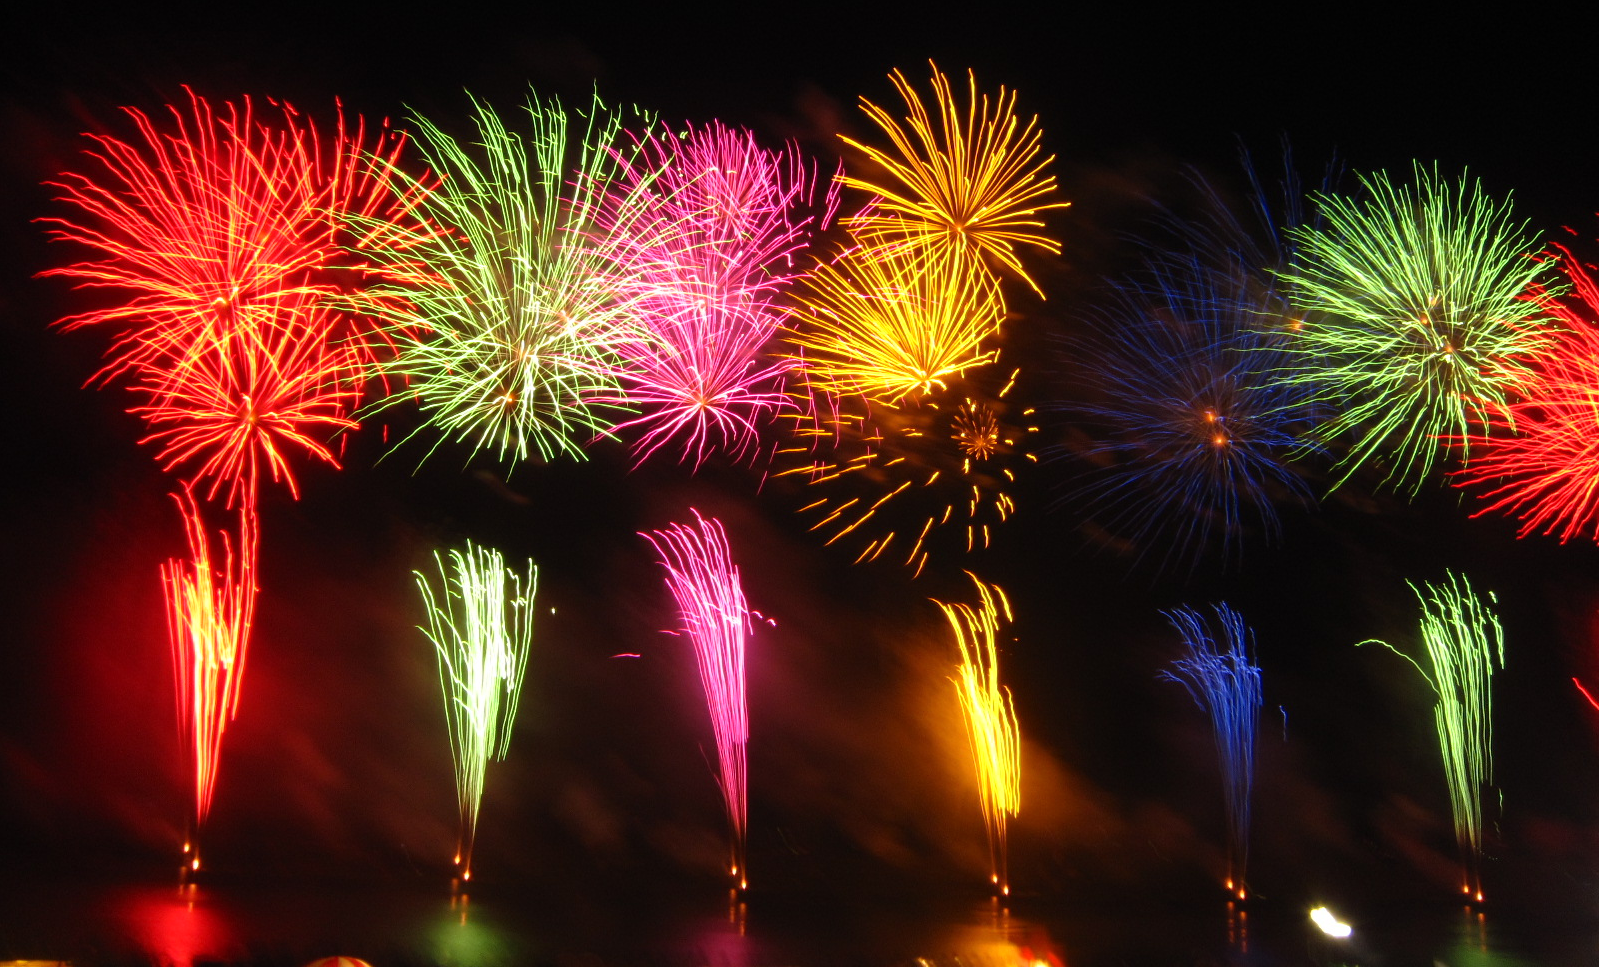 Fireworks Laboratory